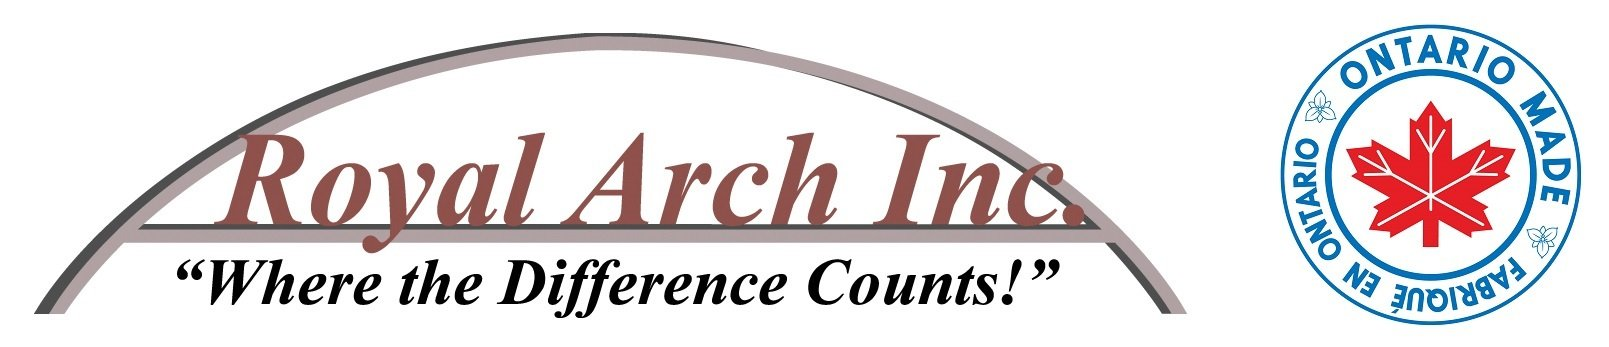 Royal Arch Inc.